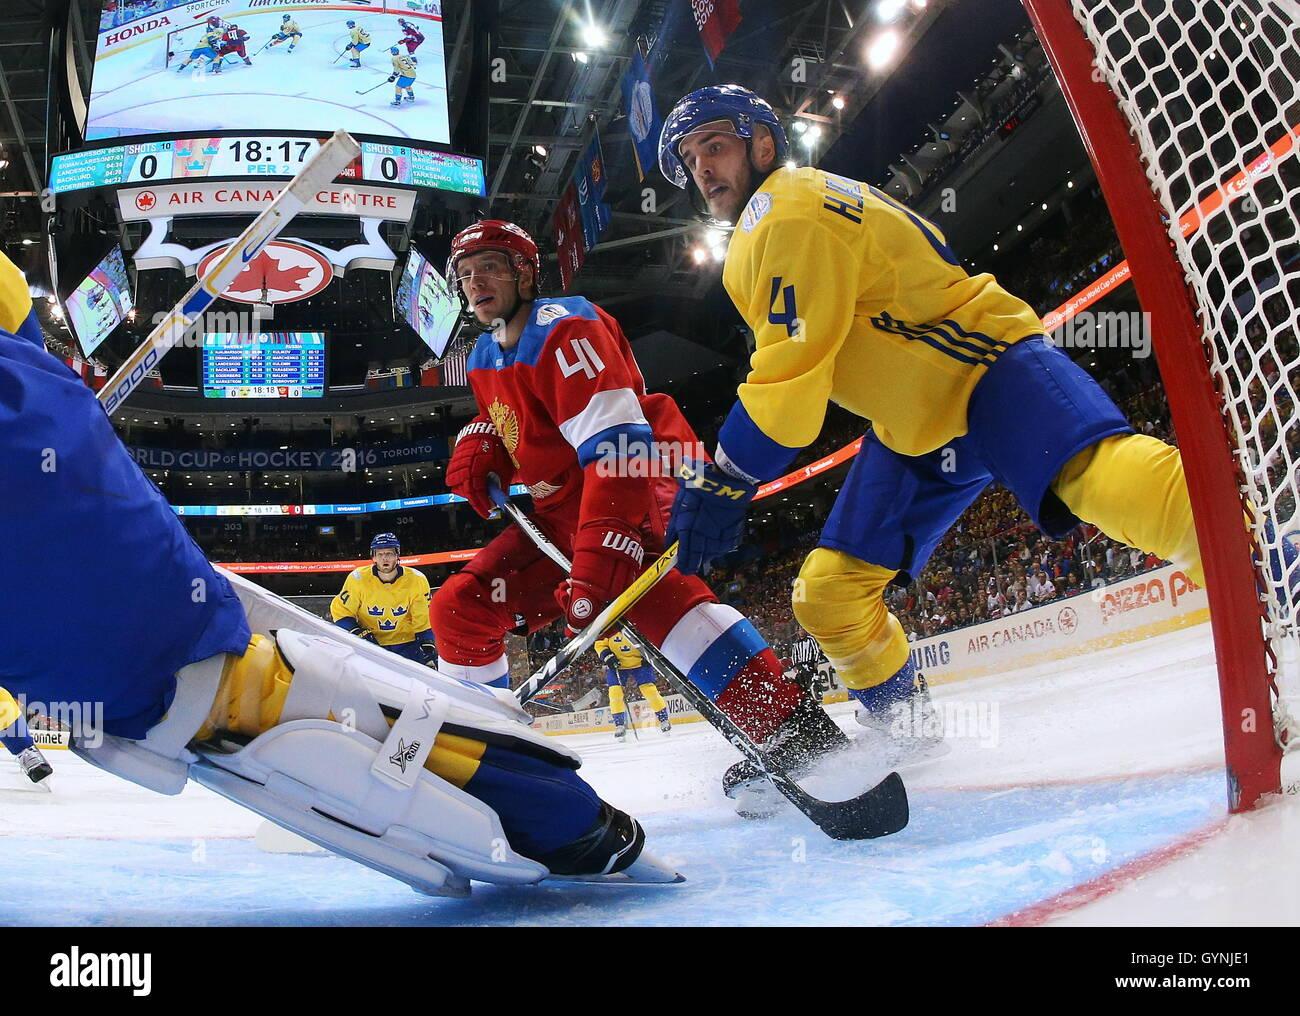 TORONTO, CANADA – SEPTEMBER 18, 2016: Russia's Nikolai Kulyomin (L) and Sweden's Simon Hjalmarsson in action - Stock Image